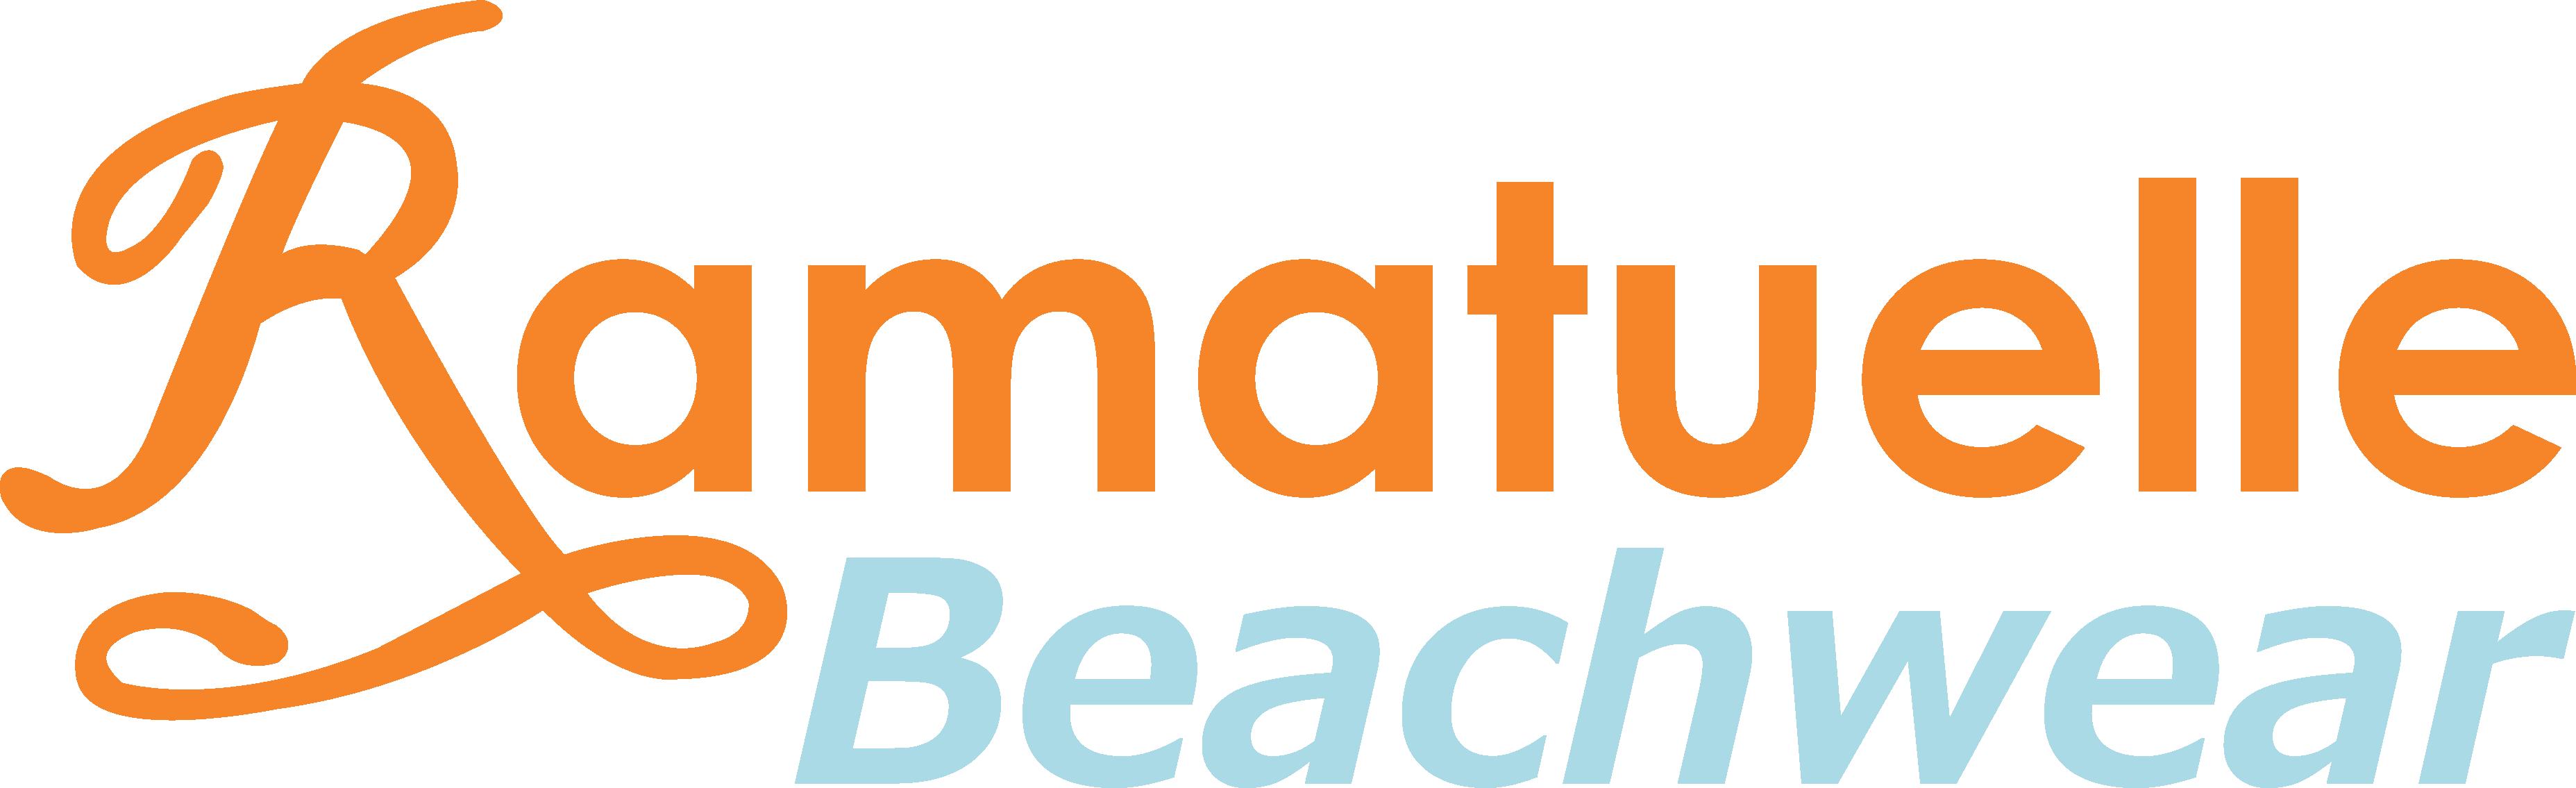 ramatuelle beachwear logo